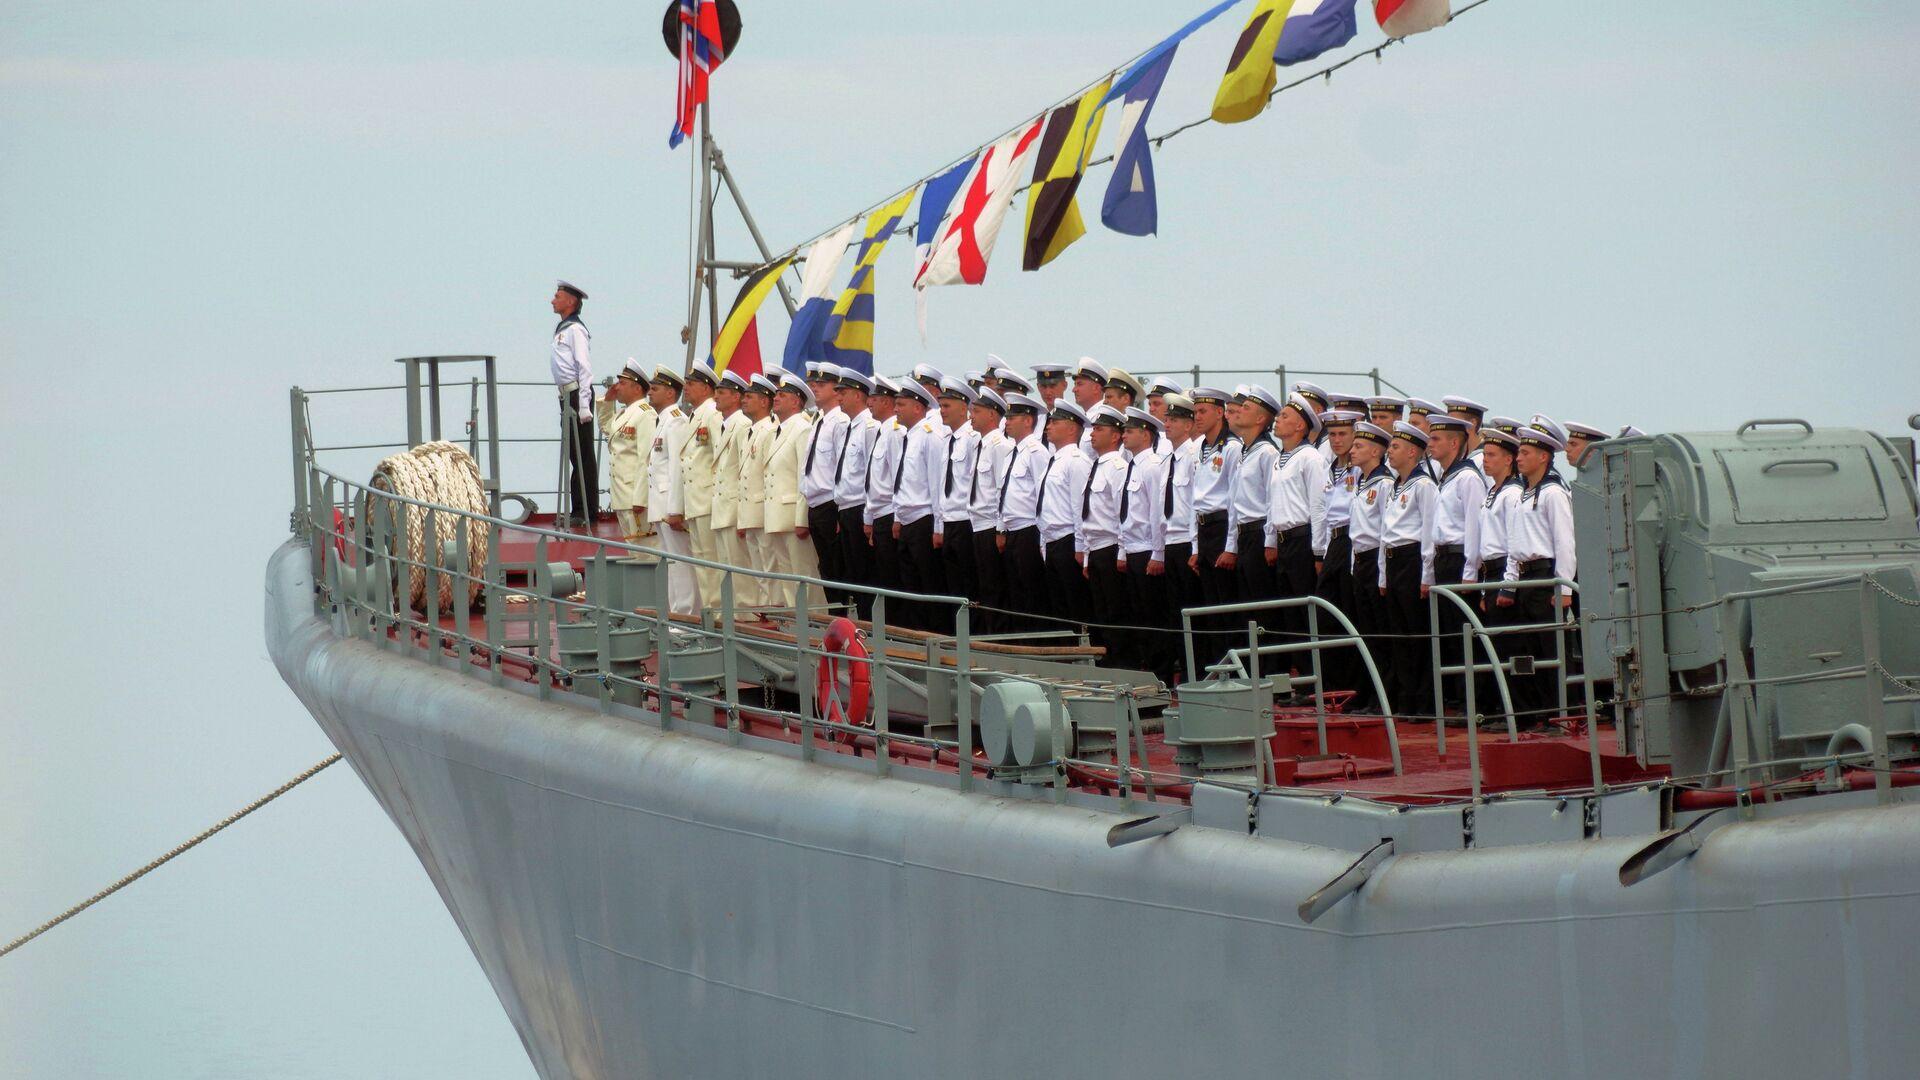 Rosyjska flota na morzu Czarnym - Sputnik Polska, 1920, 02.07.2021